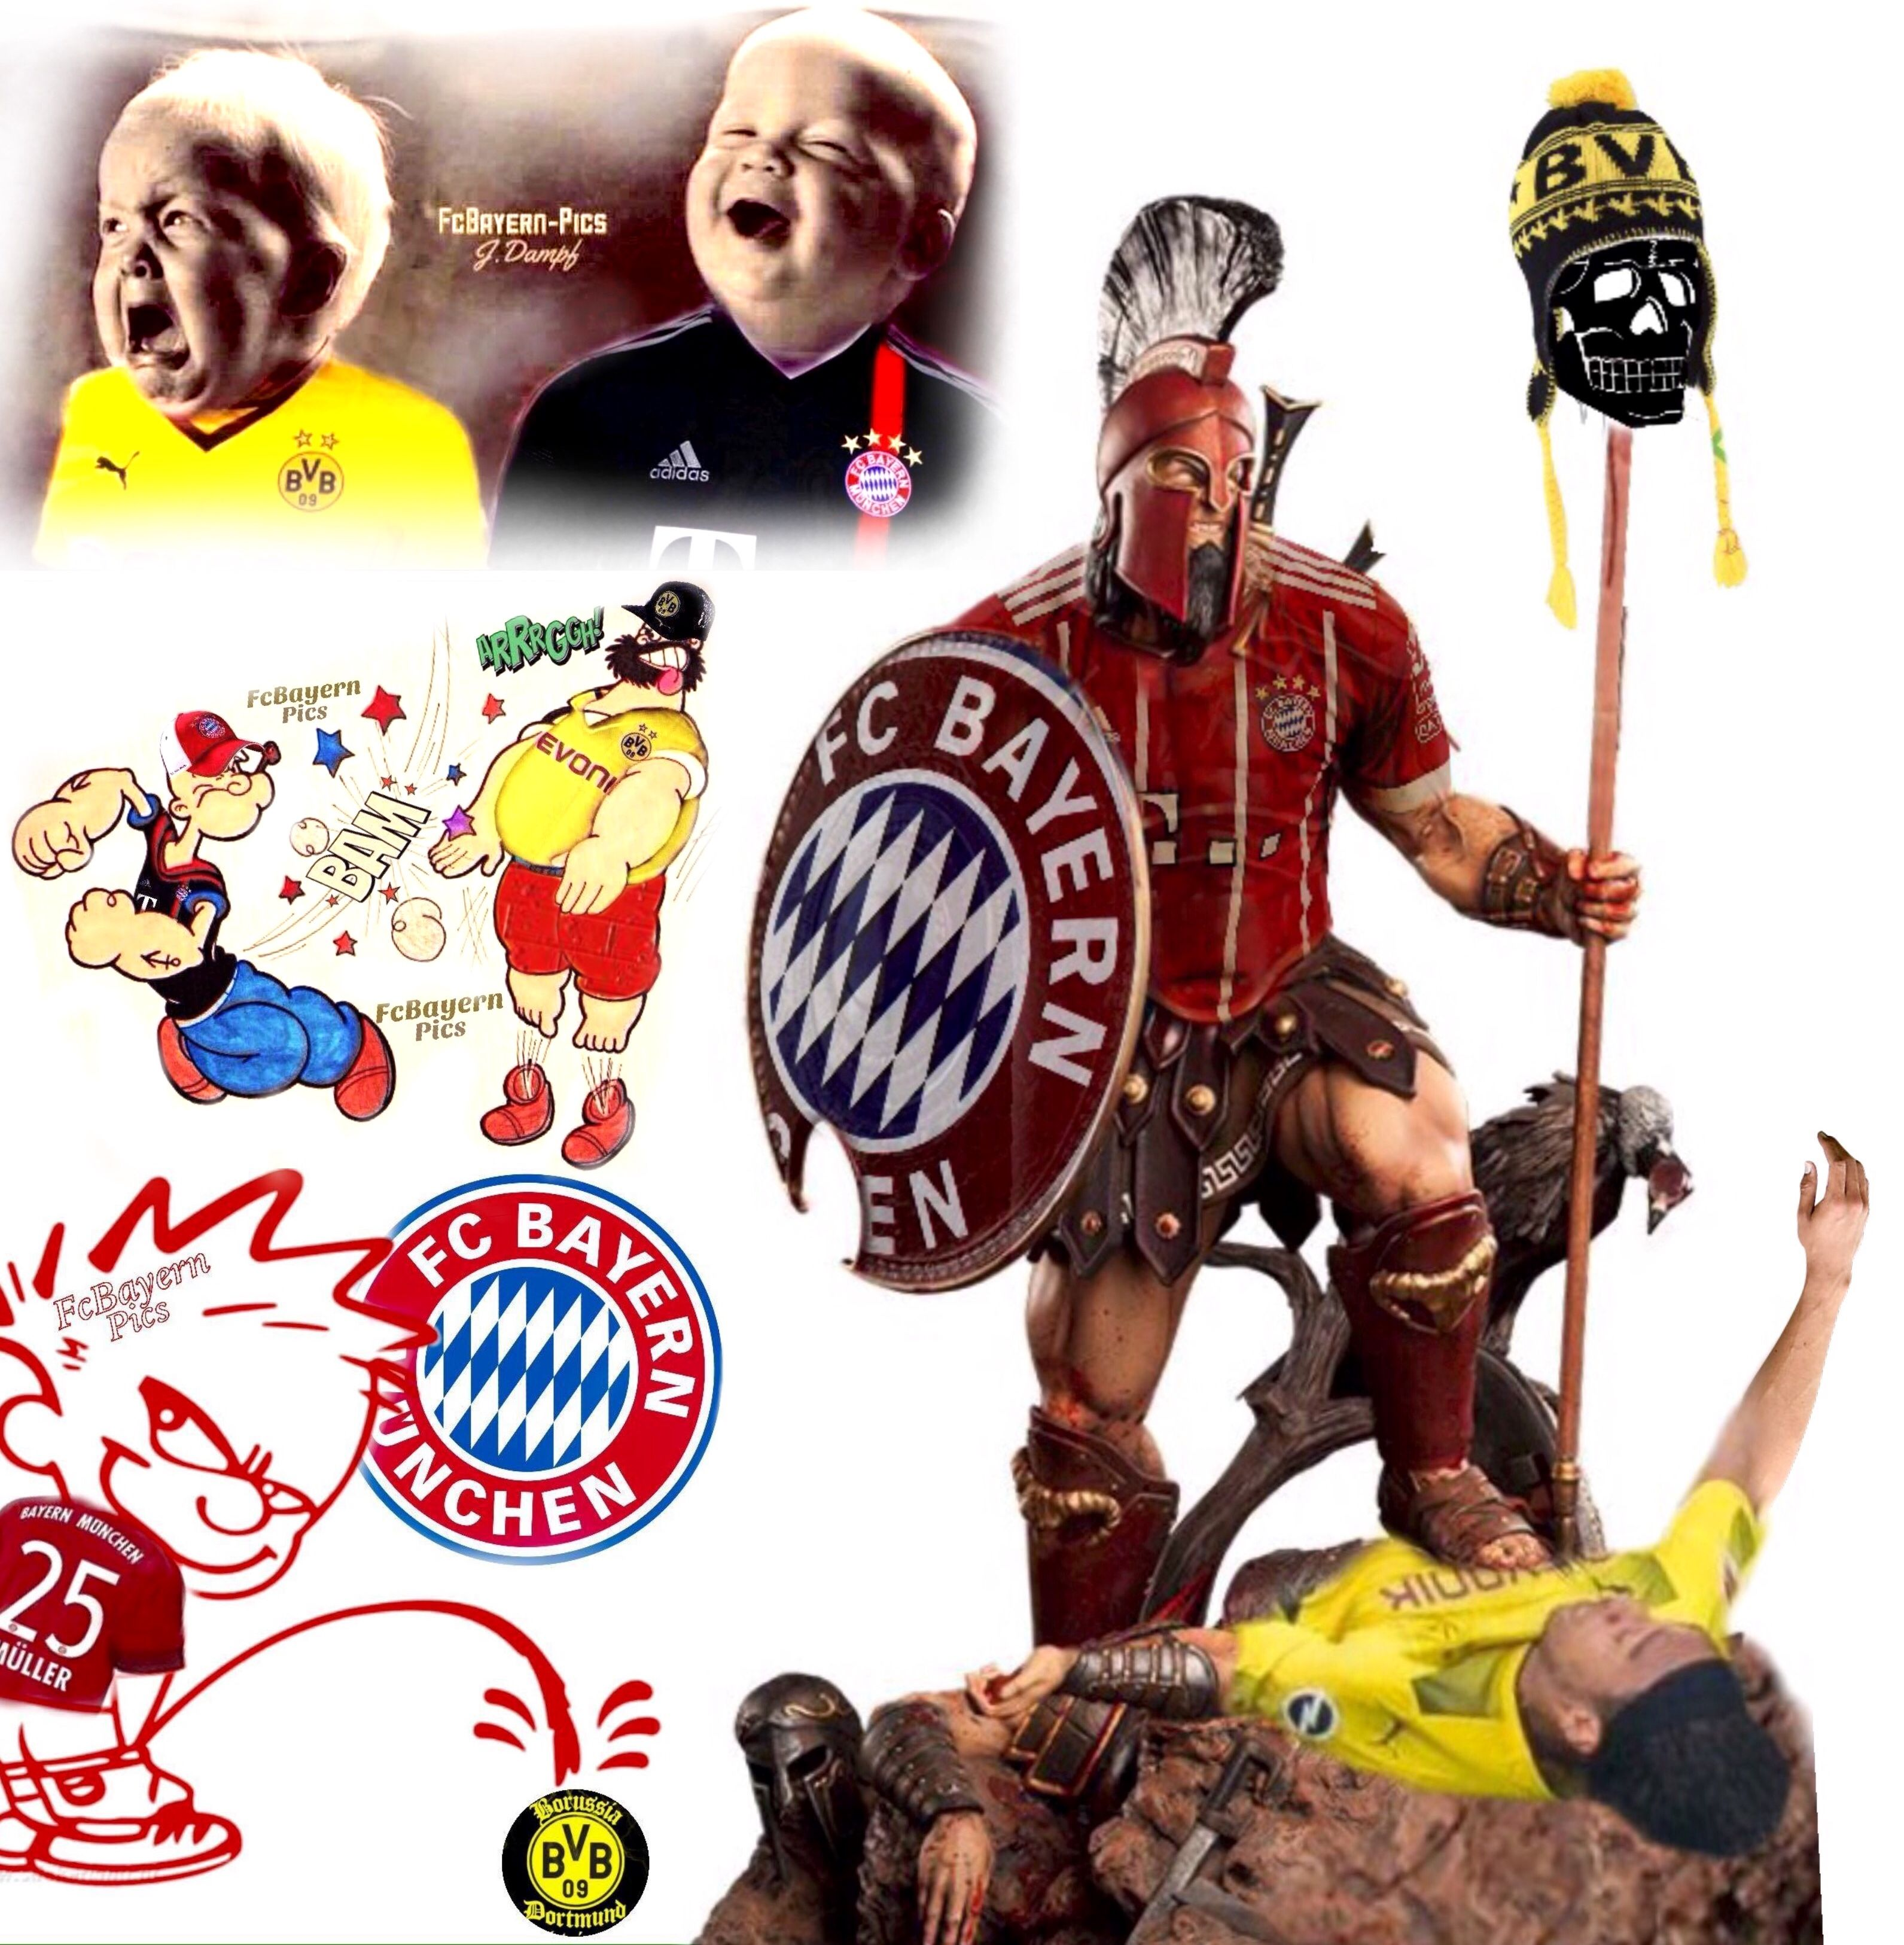 Lustige Bilder Bayern